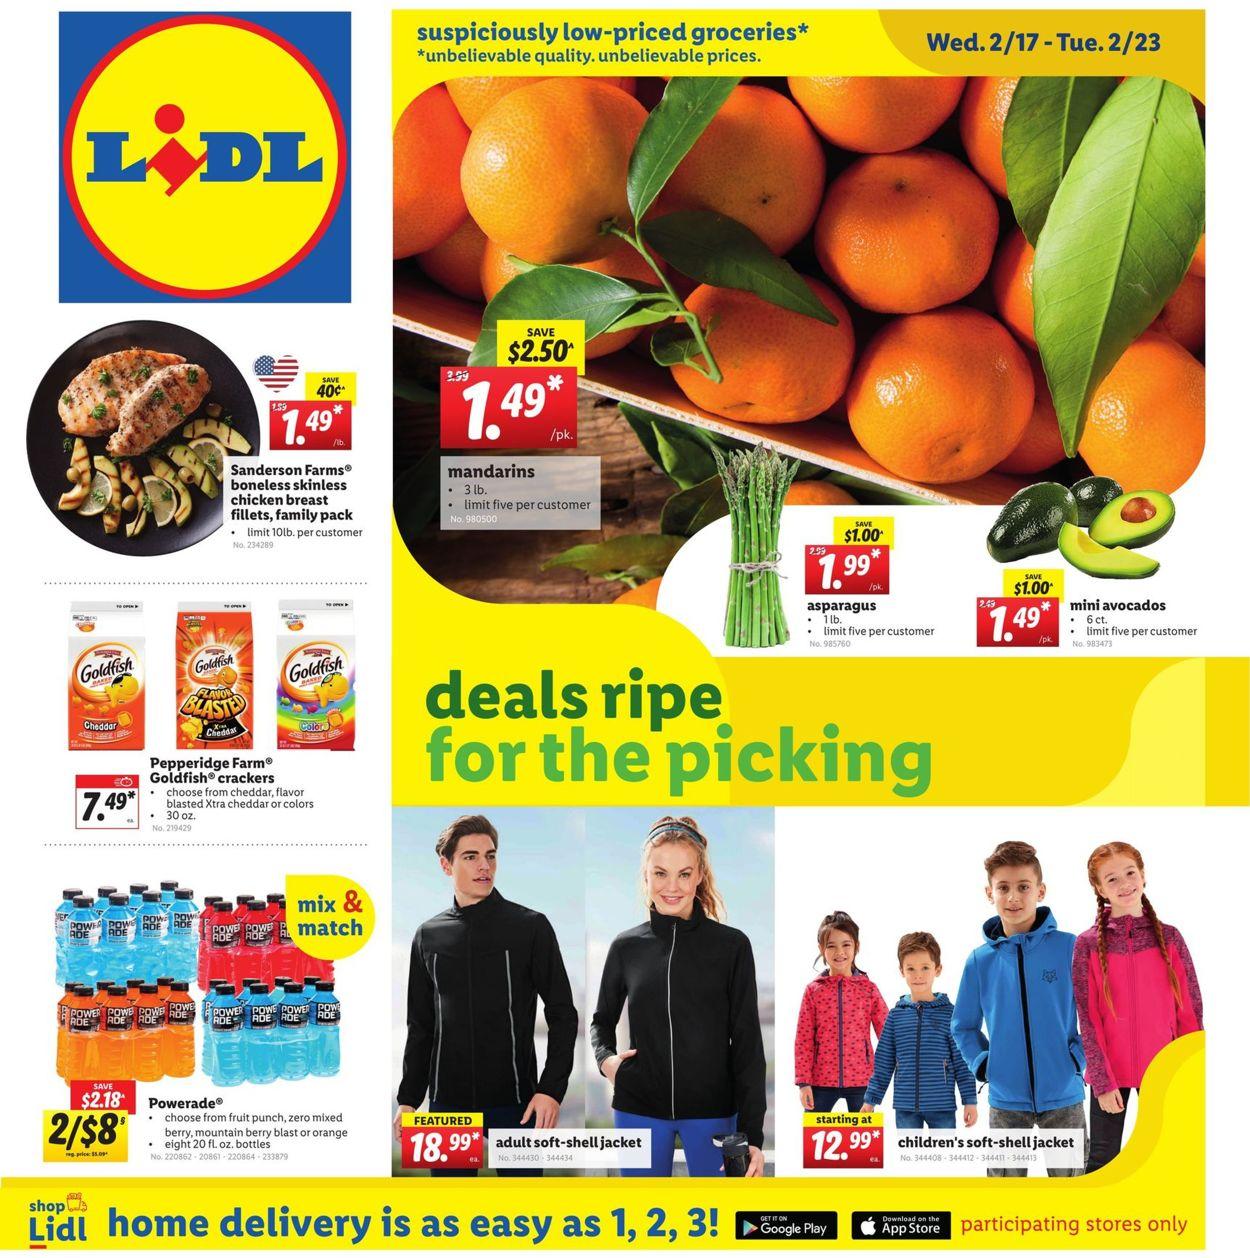 Lidl Weekly Ad Circular - valid 02/17-02/23/2021